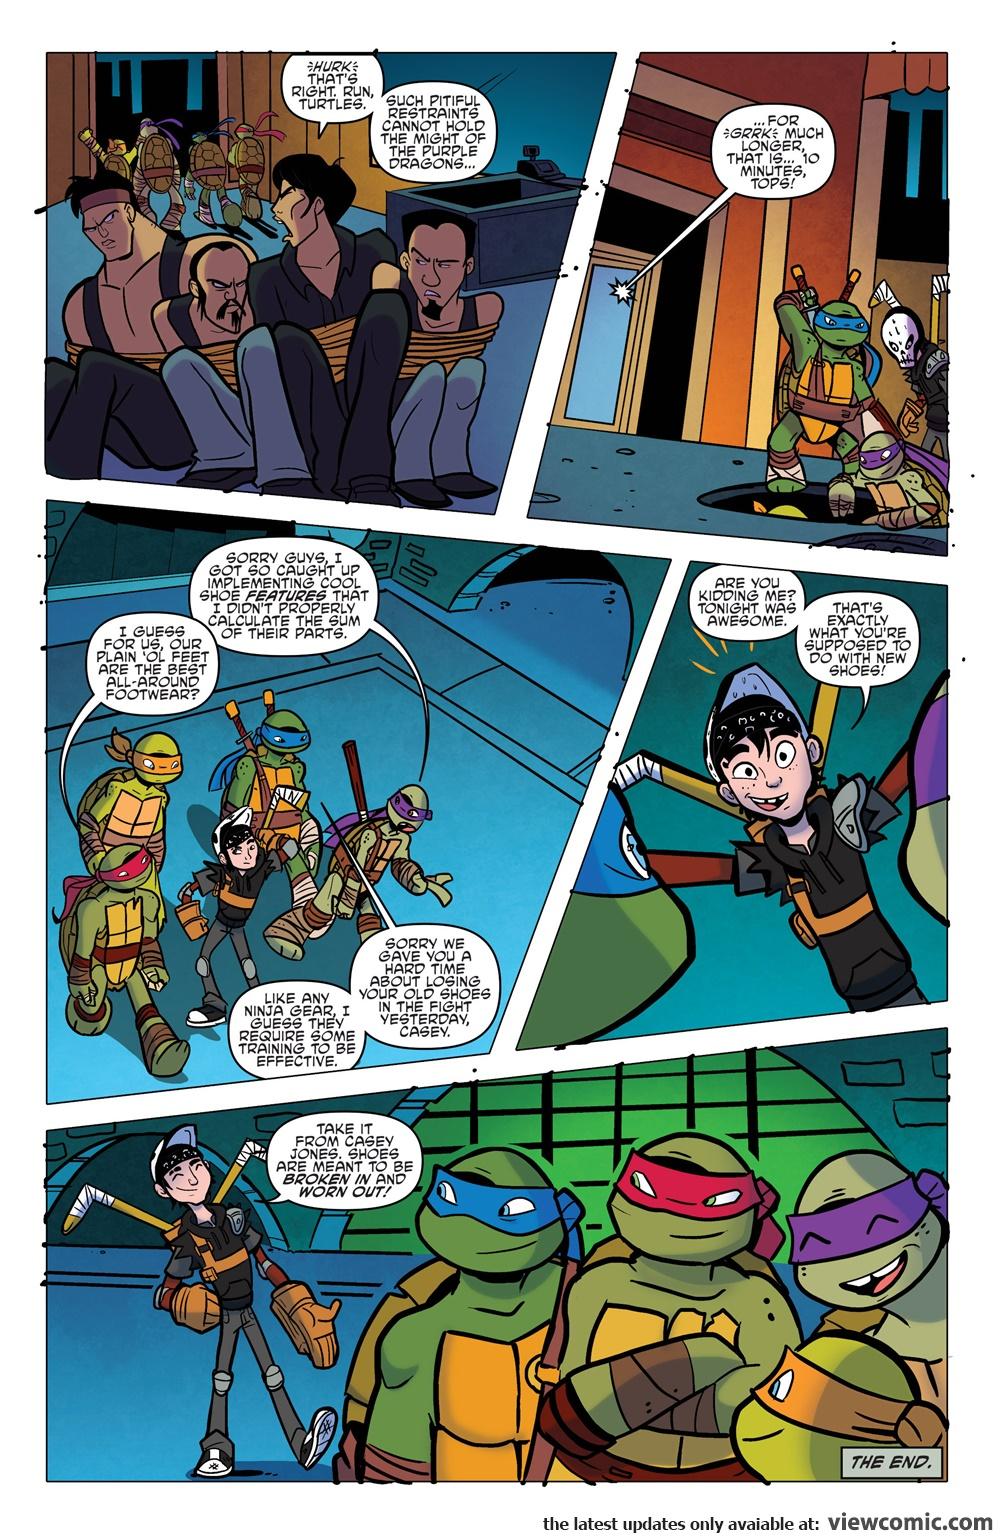 Pin By Shelby On Tmnt Teenage Mutant Ninja Turtles Batman The Long Halloween Ultimate Spiderman